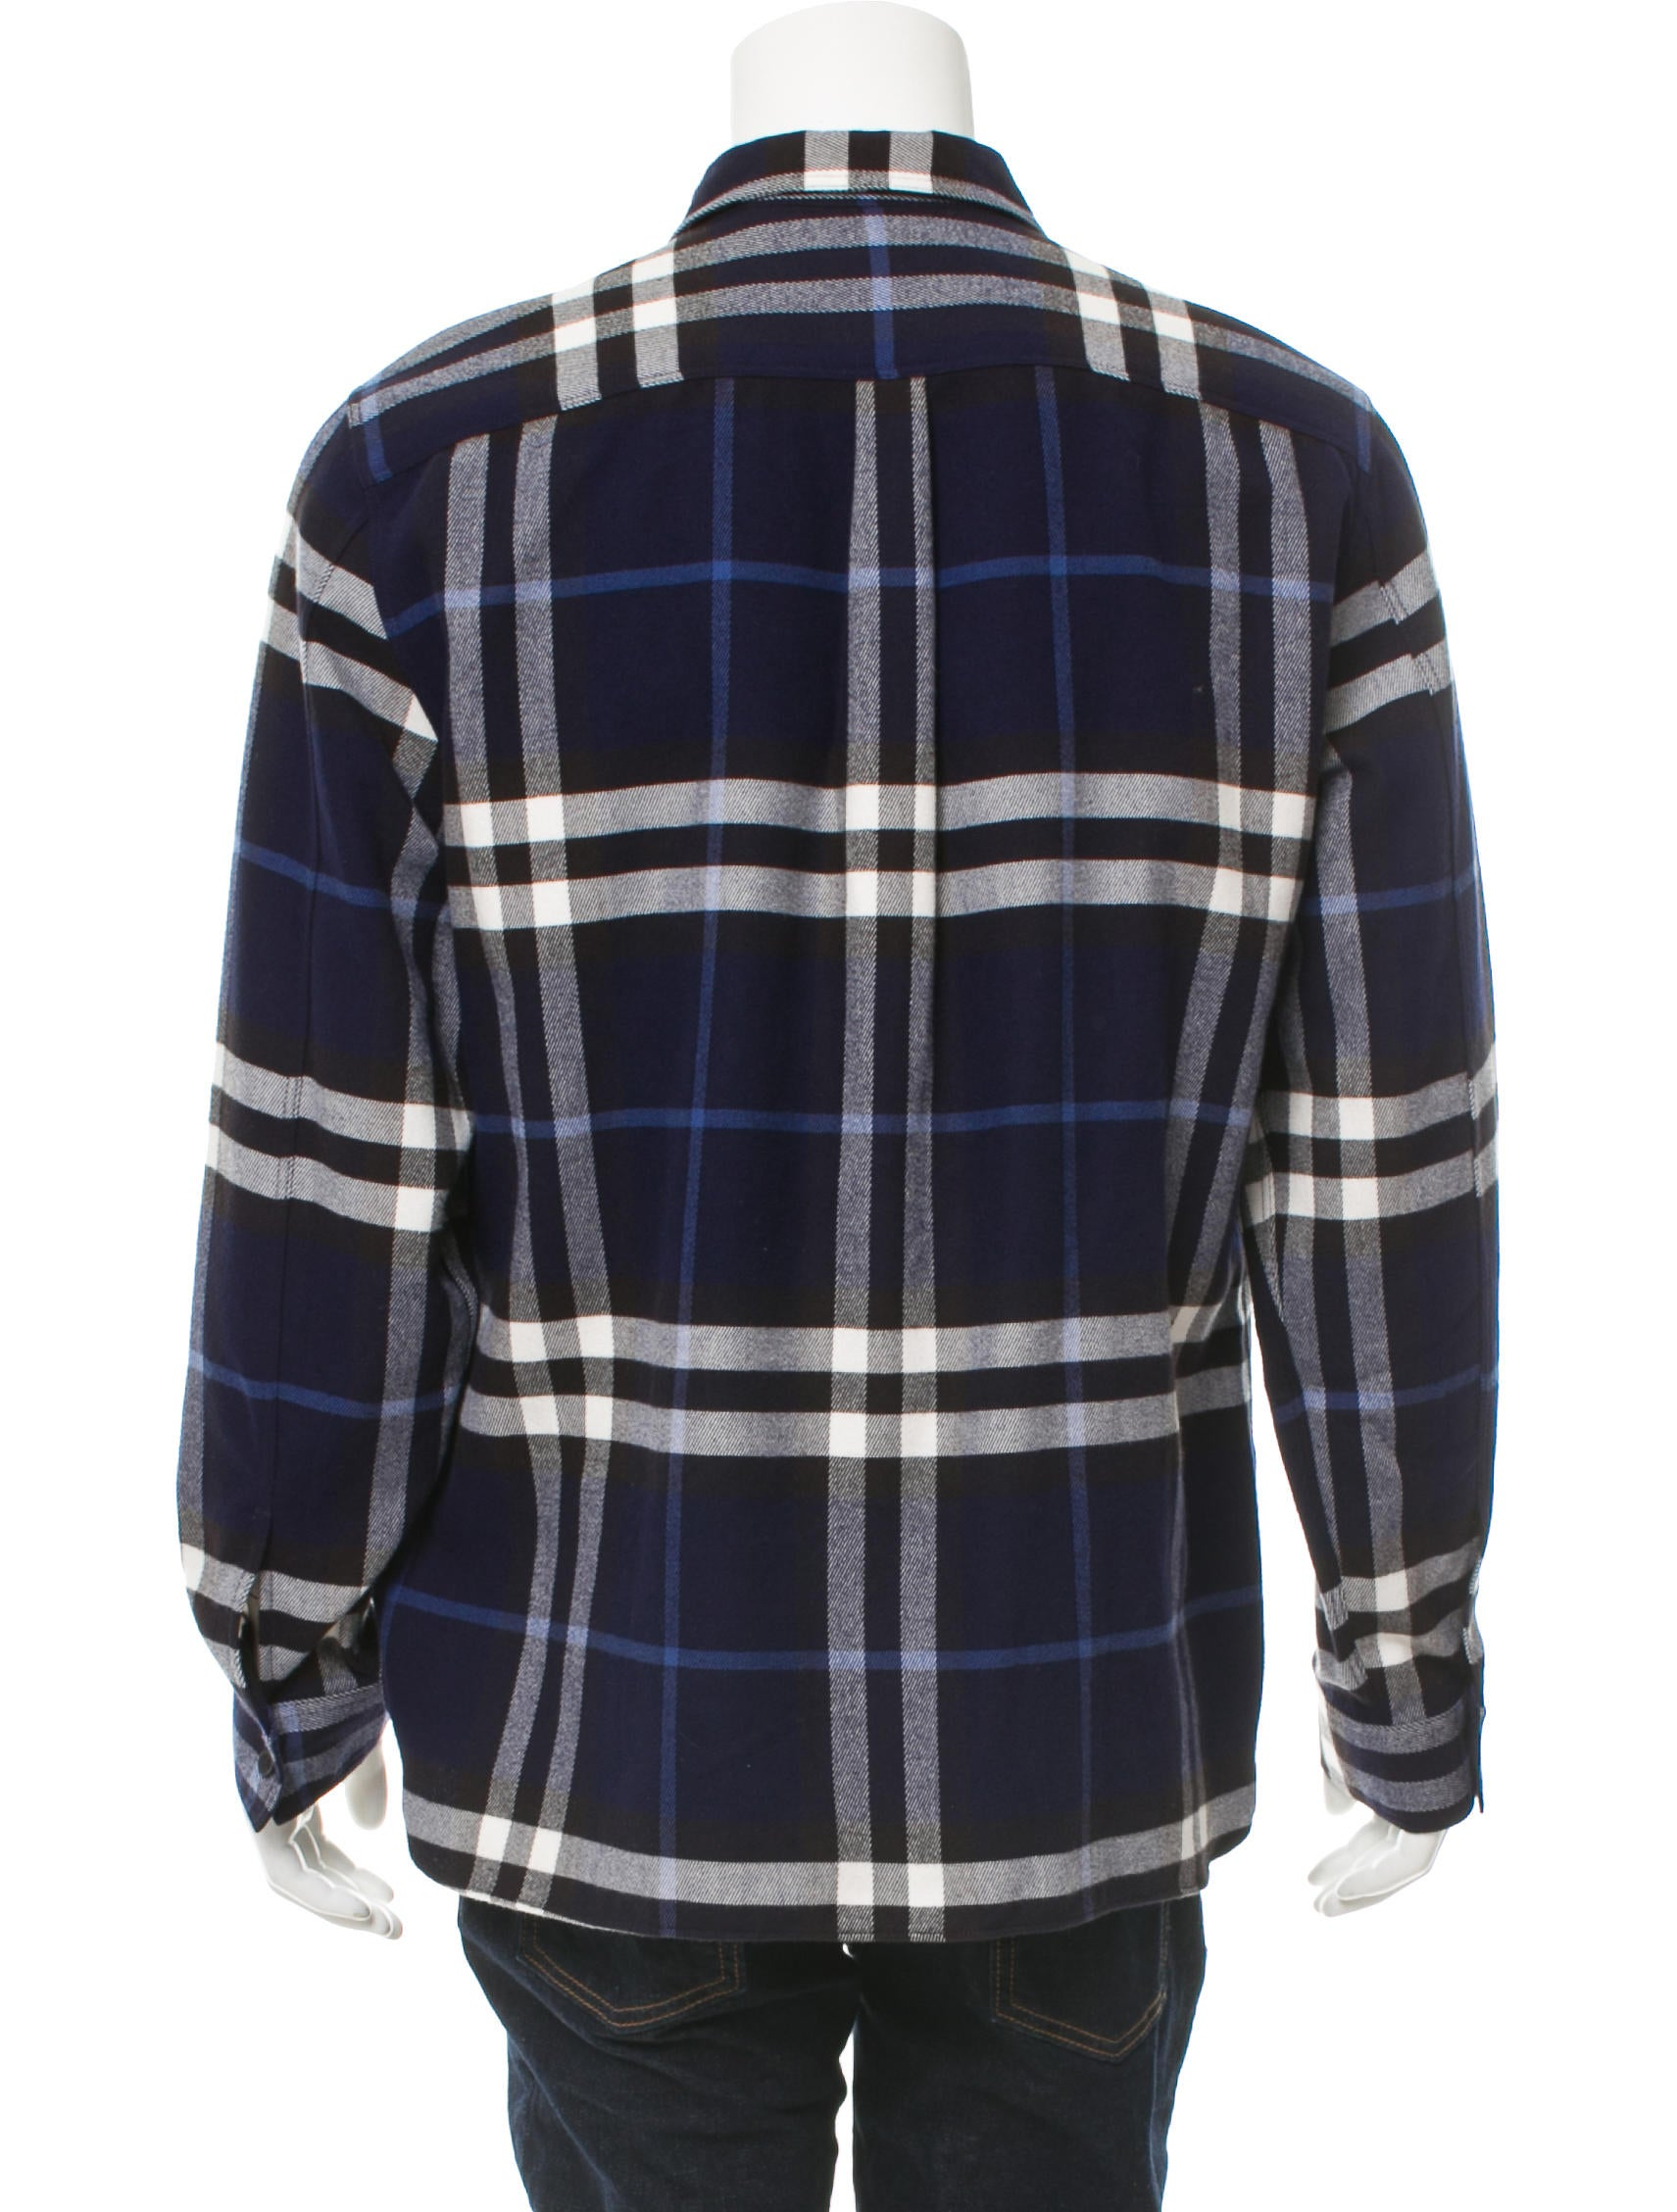 Burberry Plaid Button Up Shirt Clothing Bur78470 The